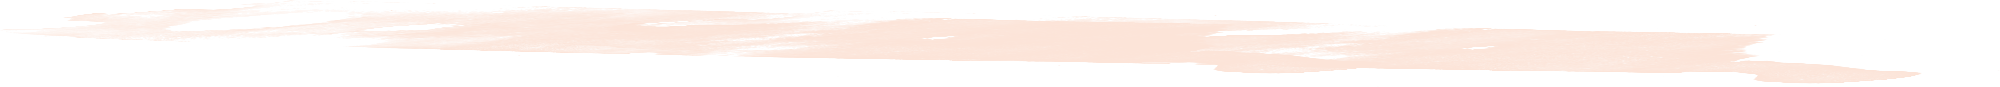 watercolor-peach-divider.png